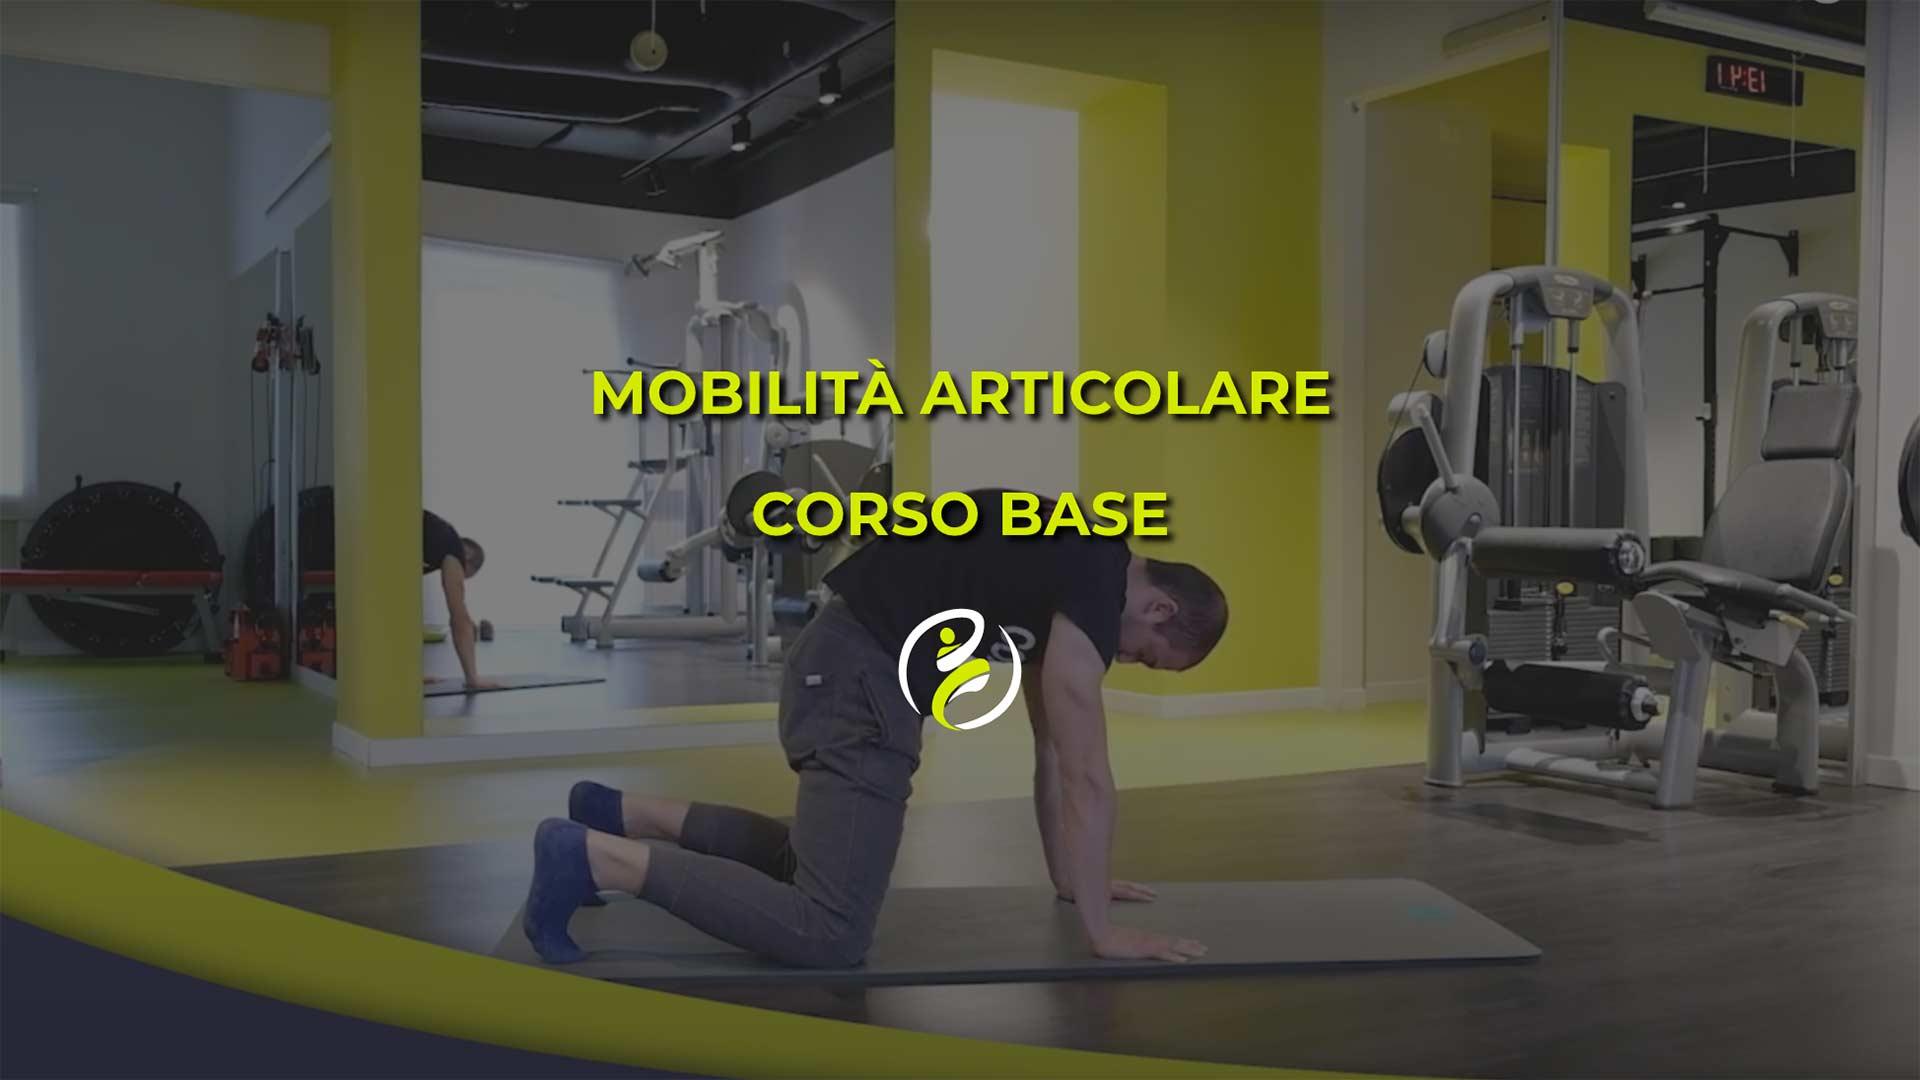 mobilita-articolare-corso-base